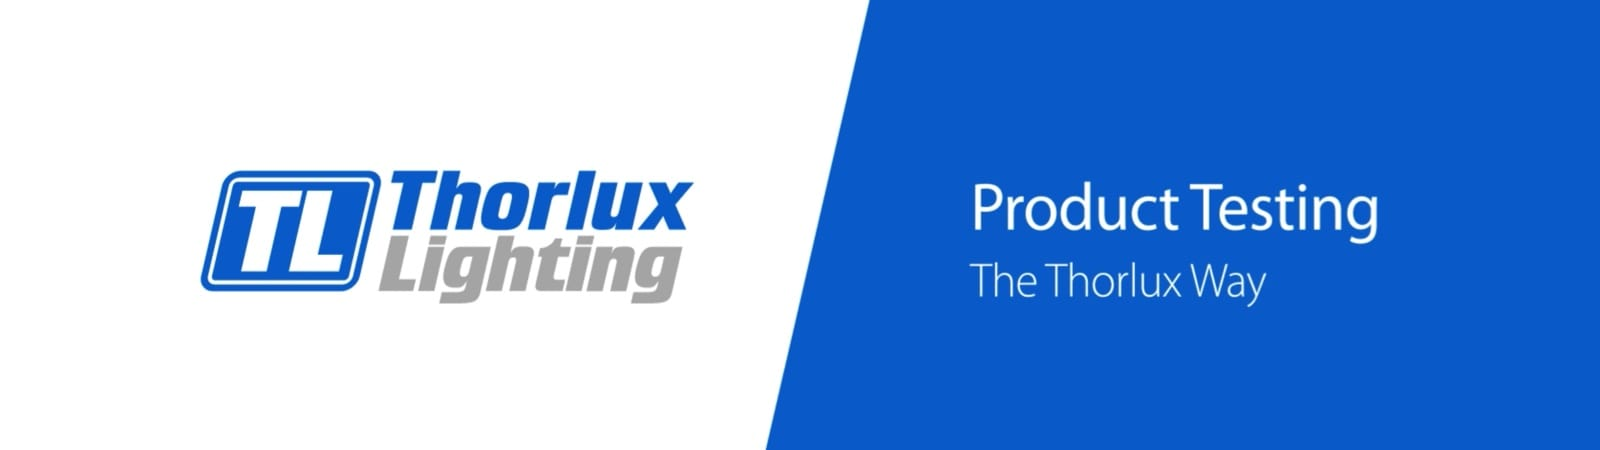 Case Study : Video for Thorlux Lighting